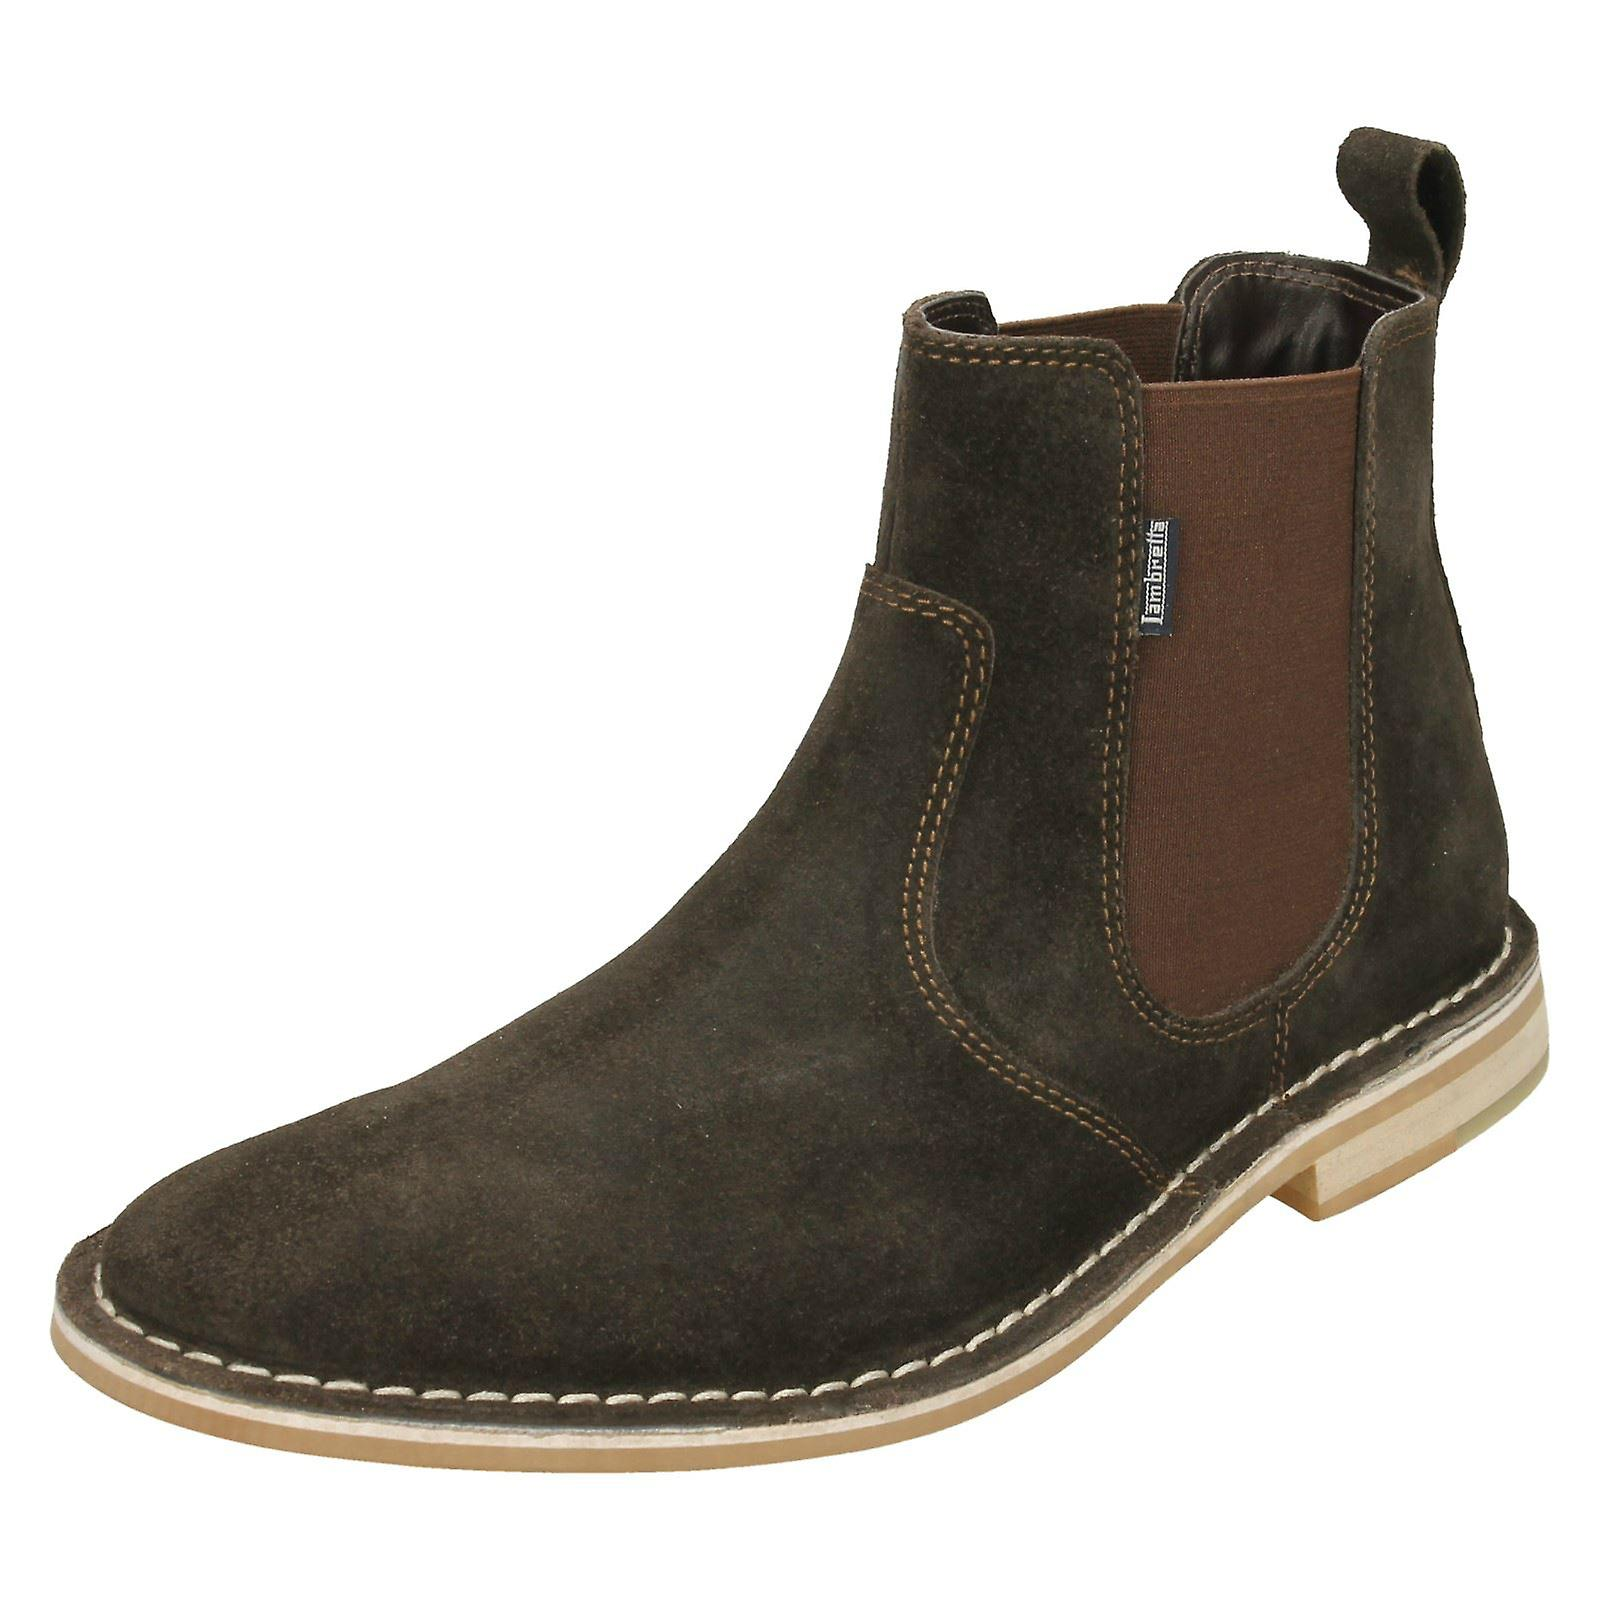 Mens Lambretta Ankle Boots Regent - Brown Suede Leather - UK Size 11 - EU  Size 45 - US Size 12